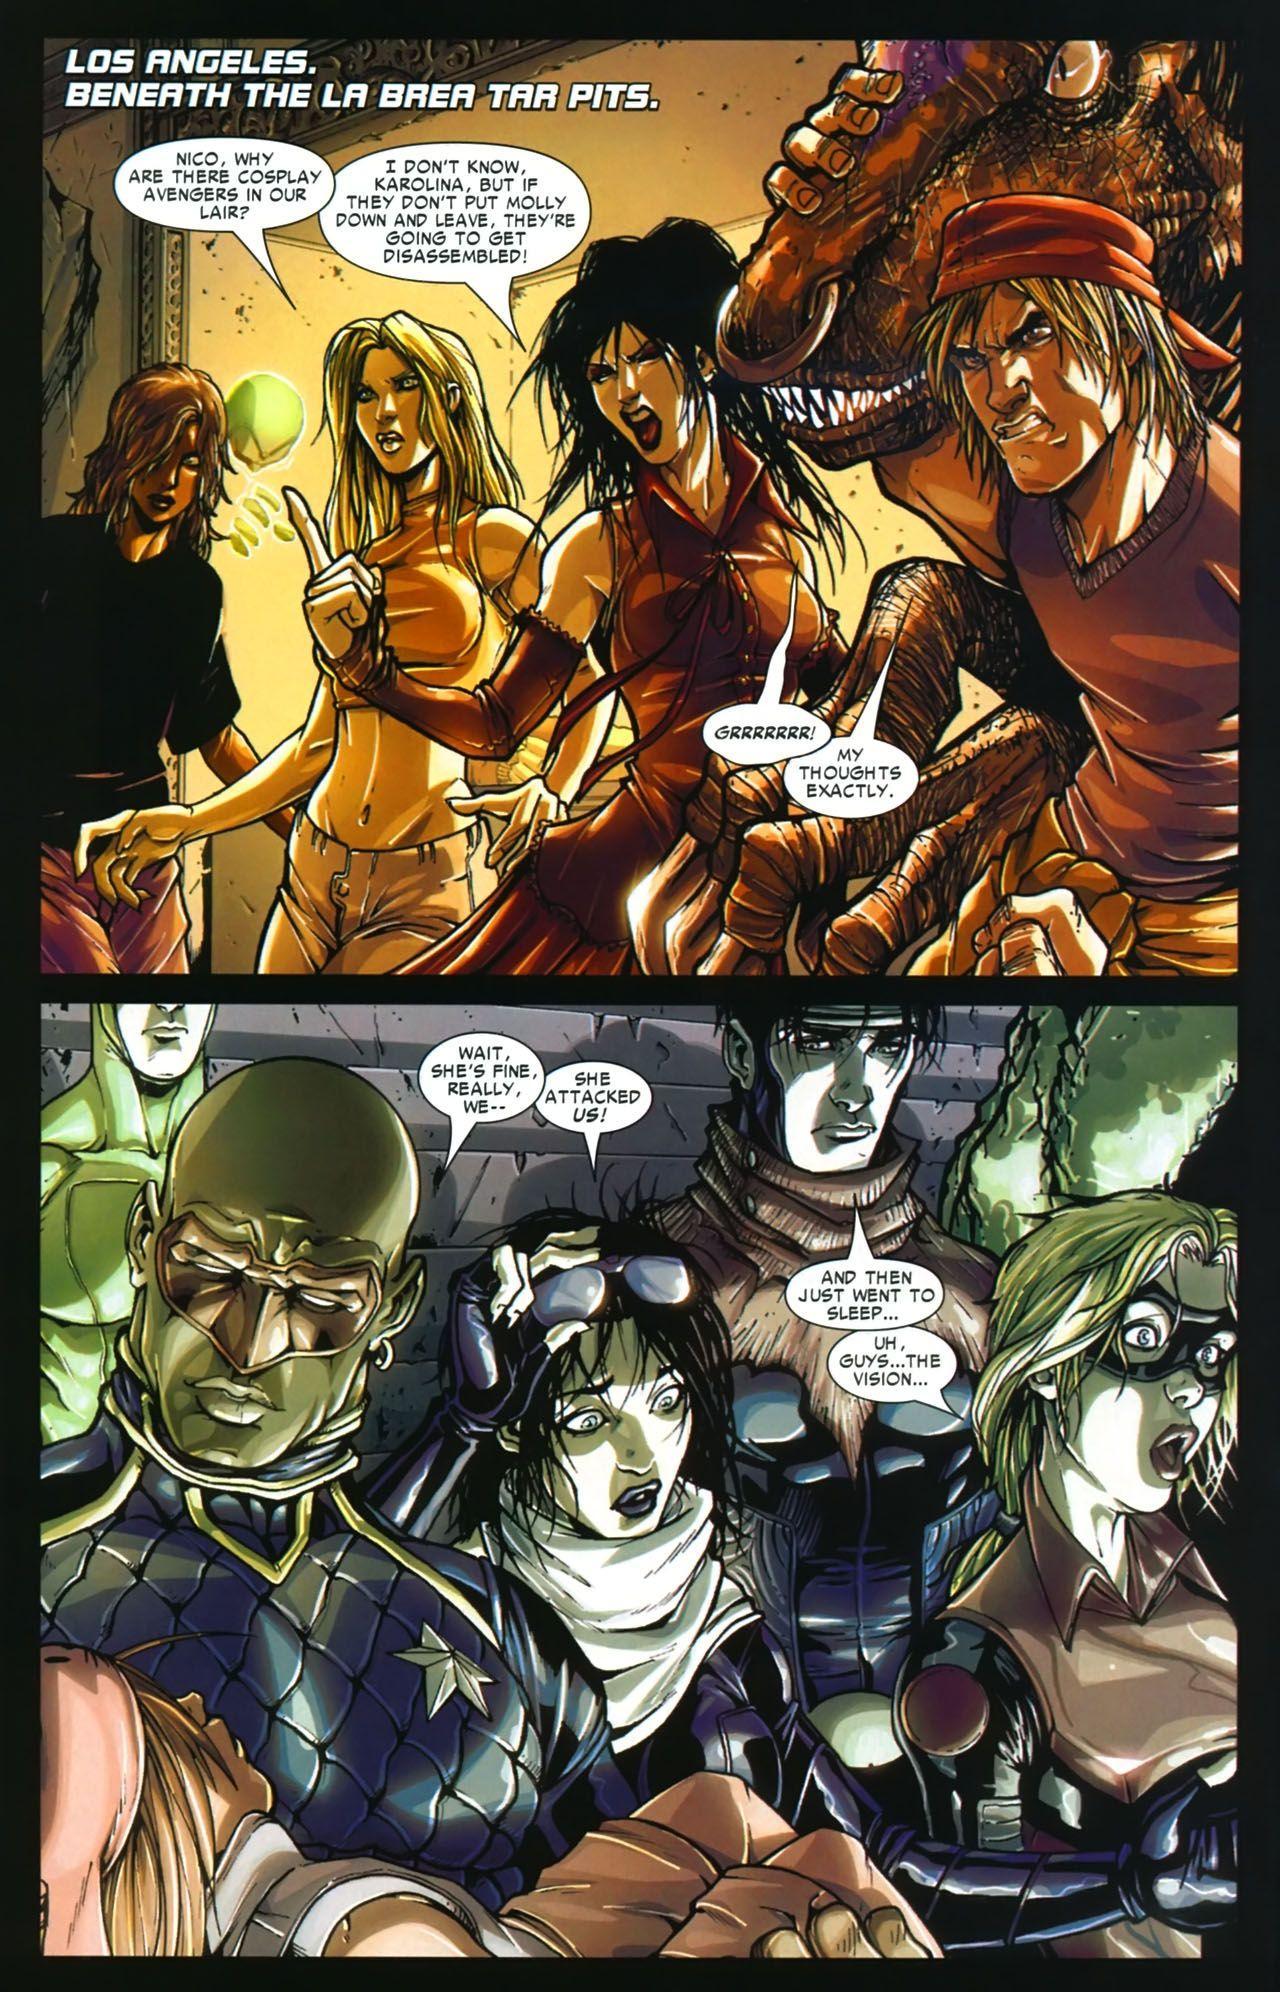 Young Avengers Runaways Civil War review